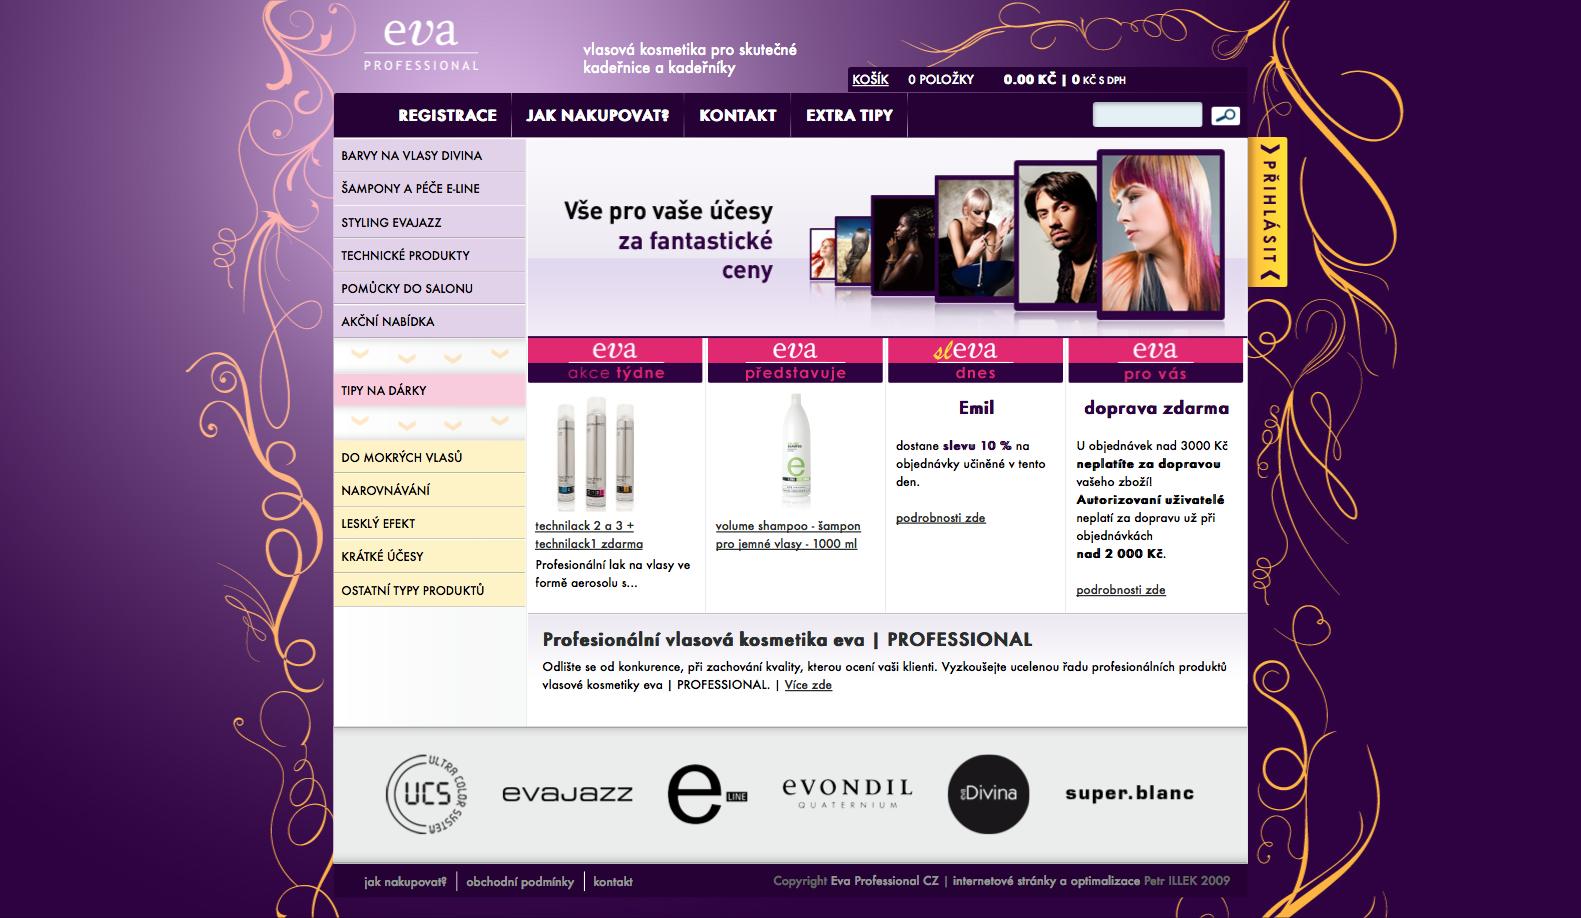 vlasová kosmetika eva | PROFESSIONAL